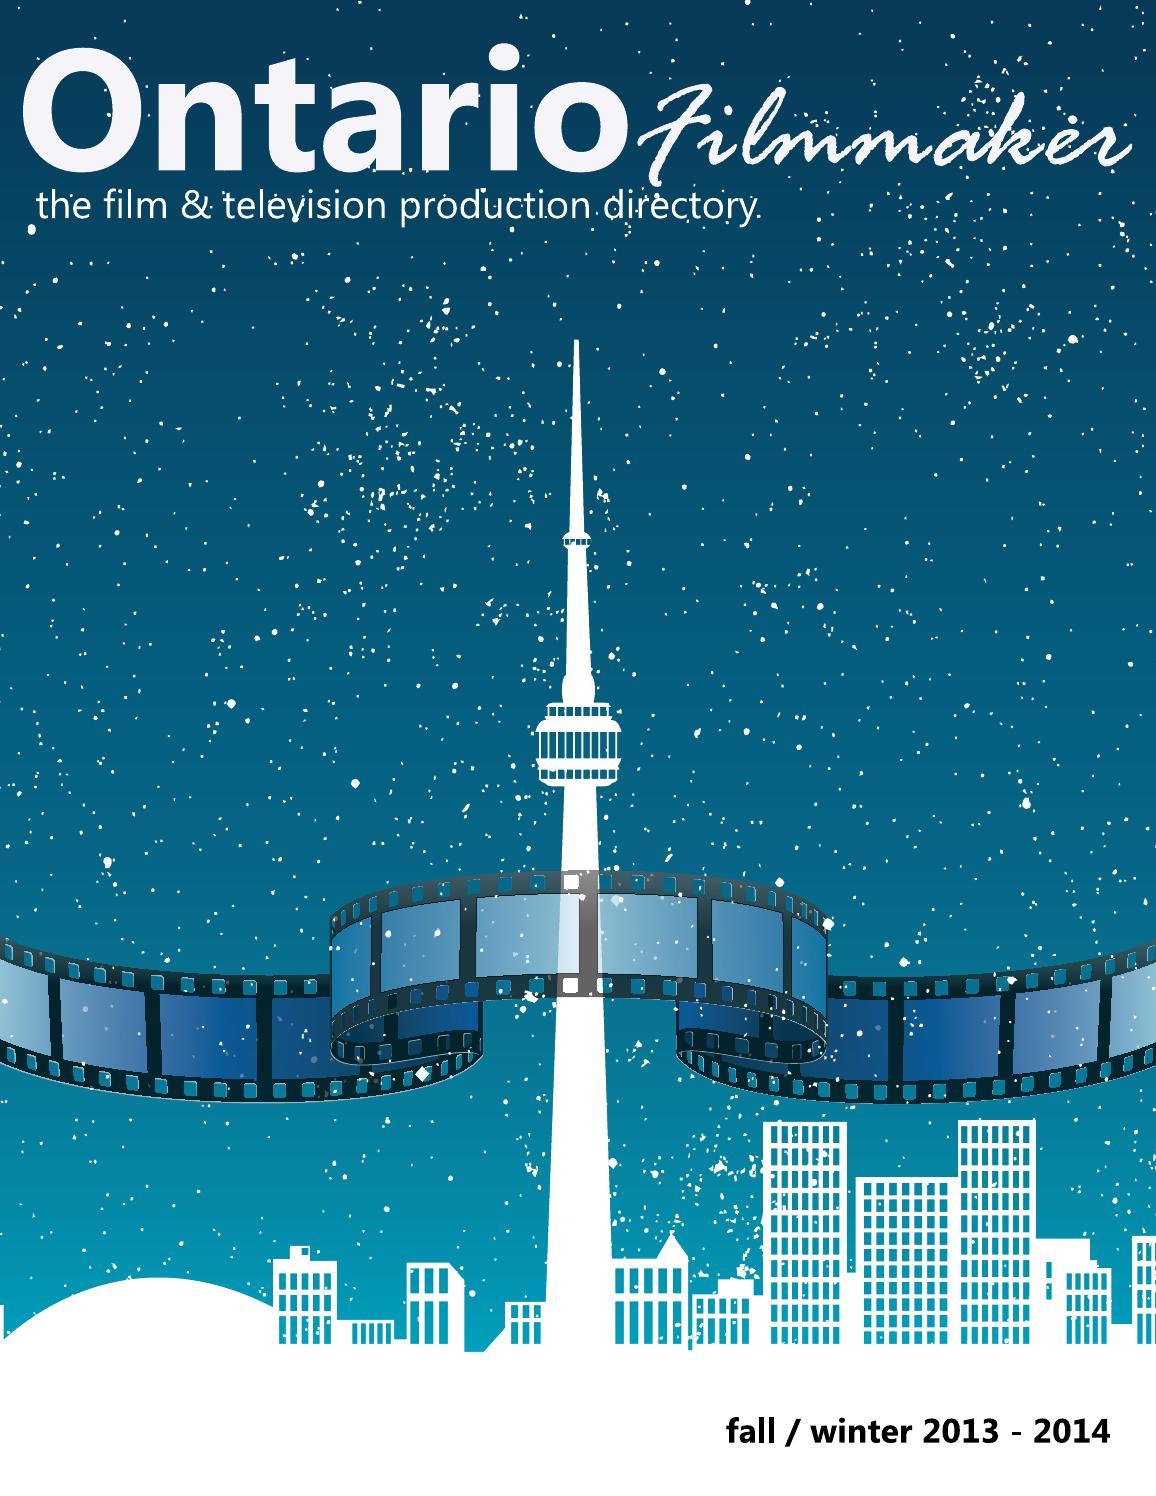 Ontario Filmmaker Directory - Fall / Winter 2013 - 2014 by Ontario ...